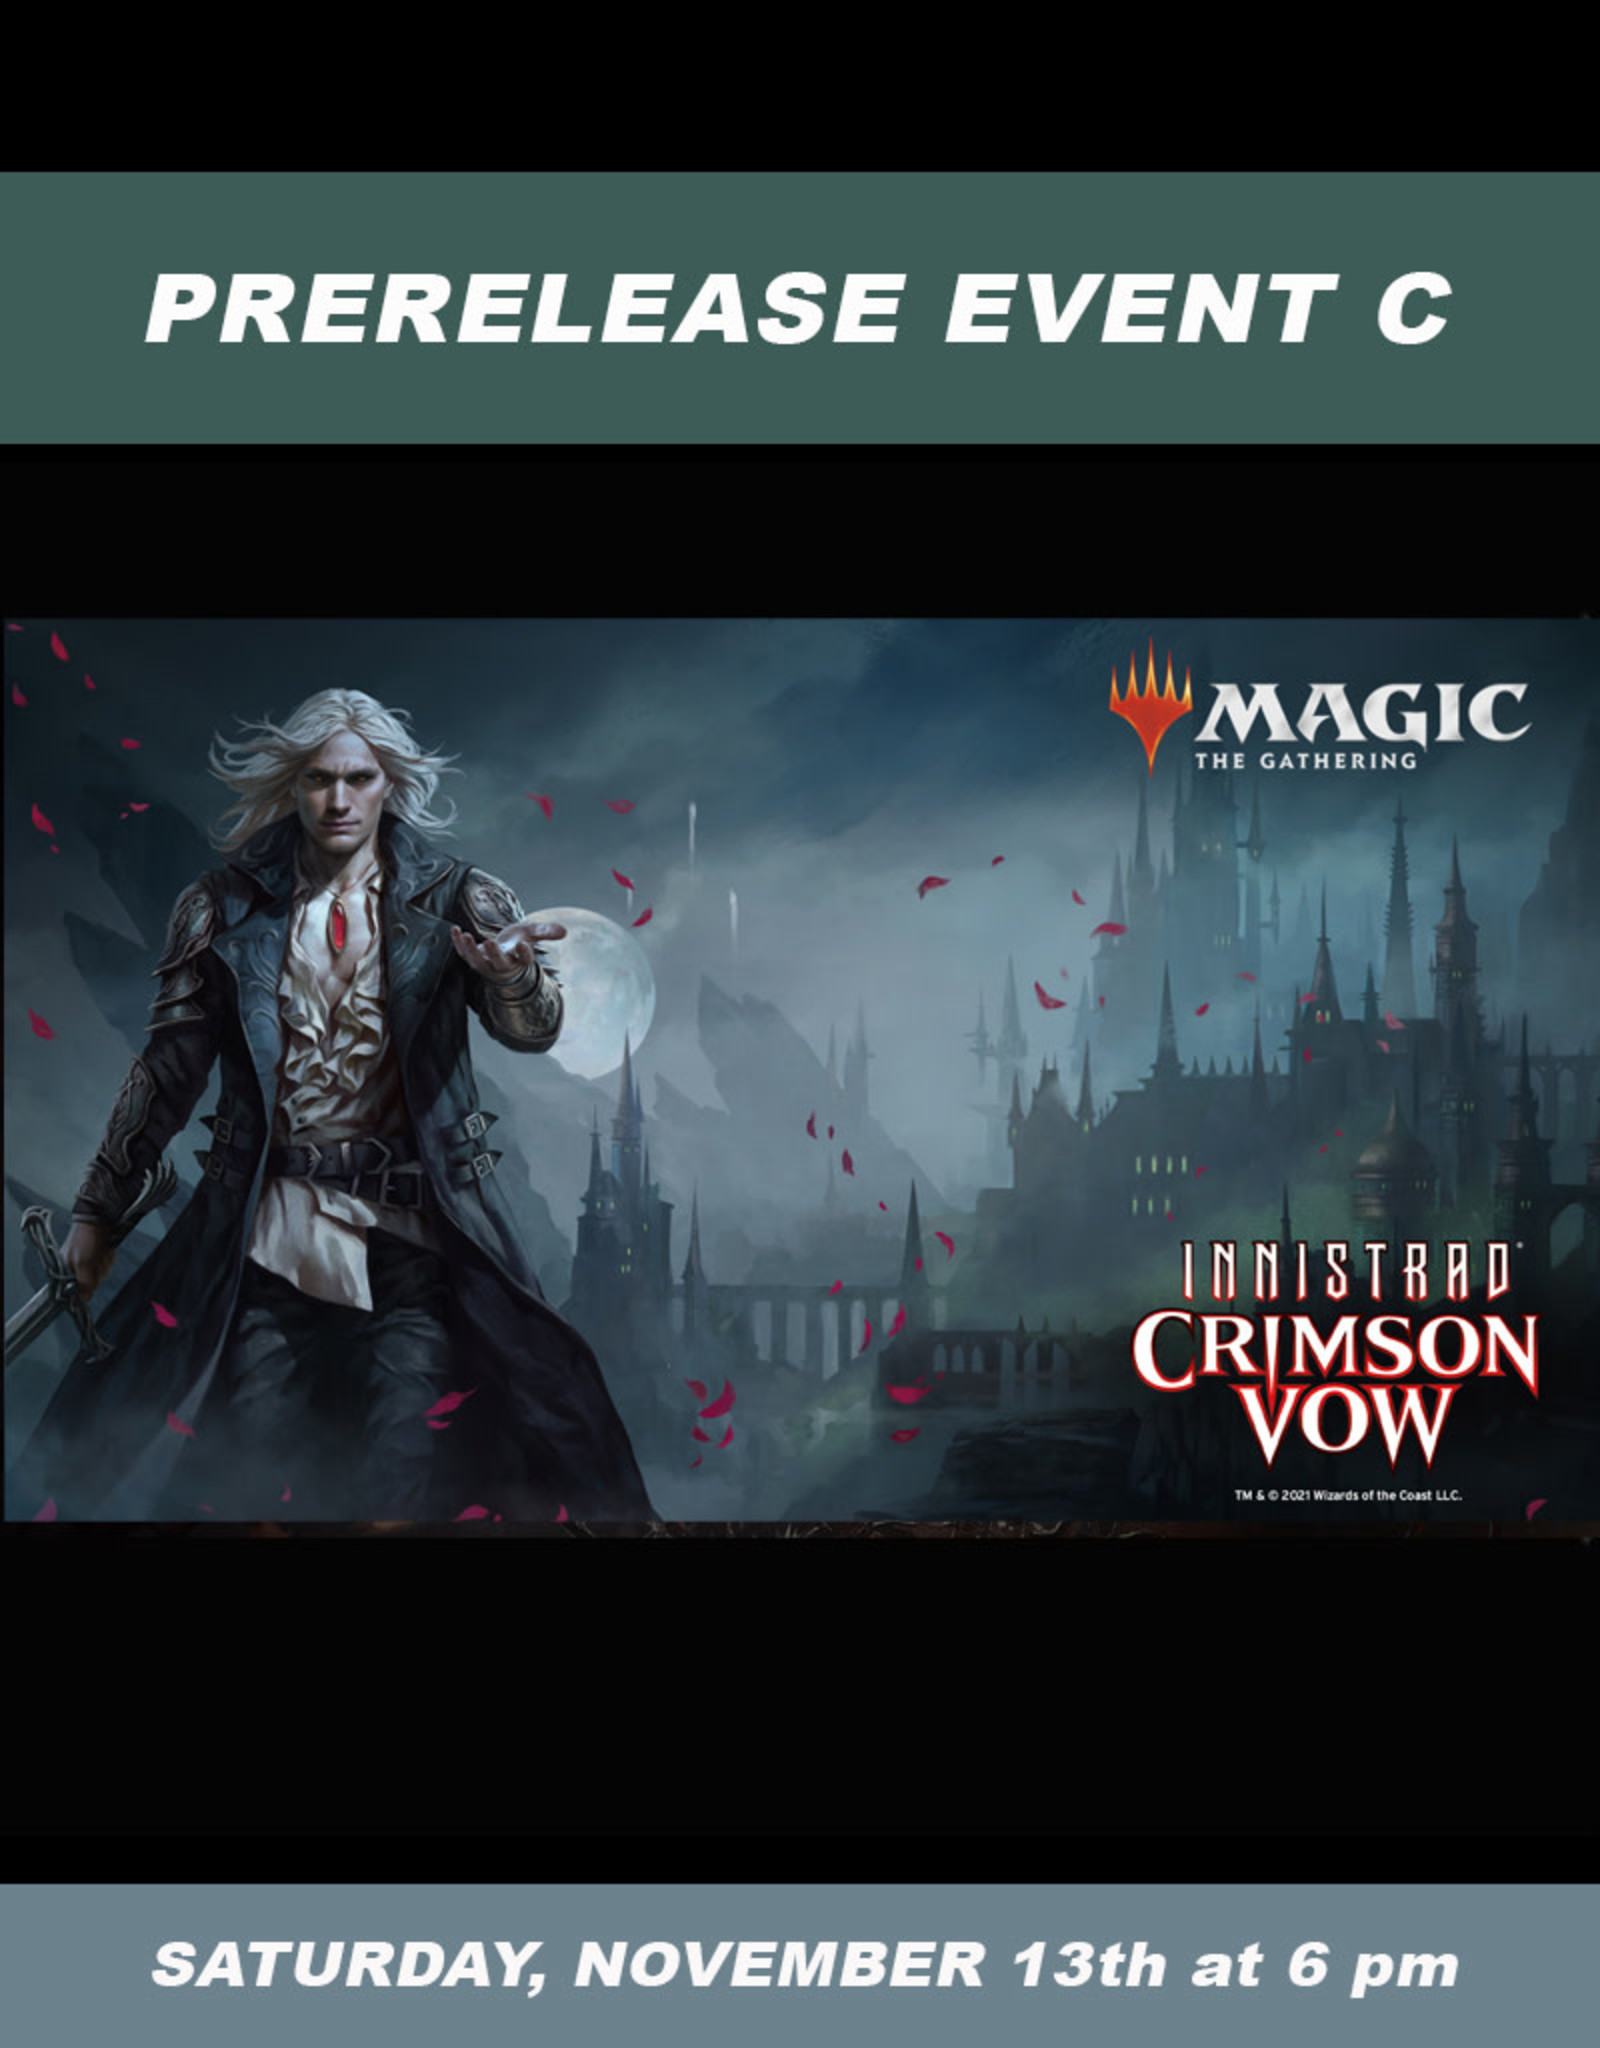 Wizards of the Coast MTG Innistrad Crimson Vow Prerelease Sealed Event C (Saturday, Nov. 13 at 6 pm)